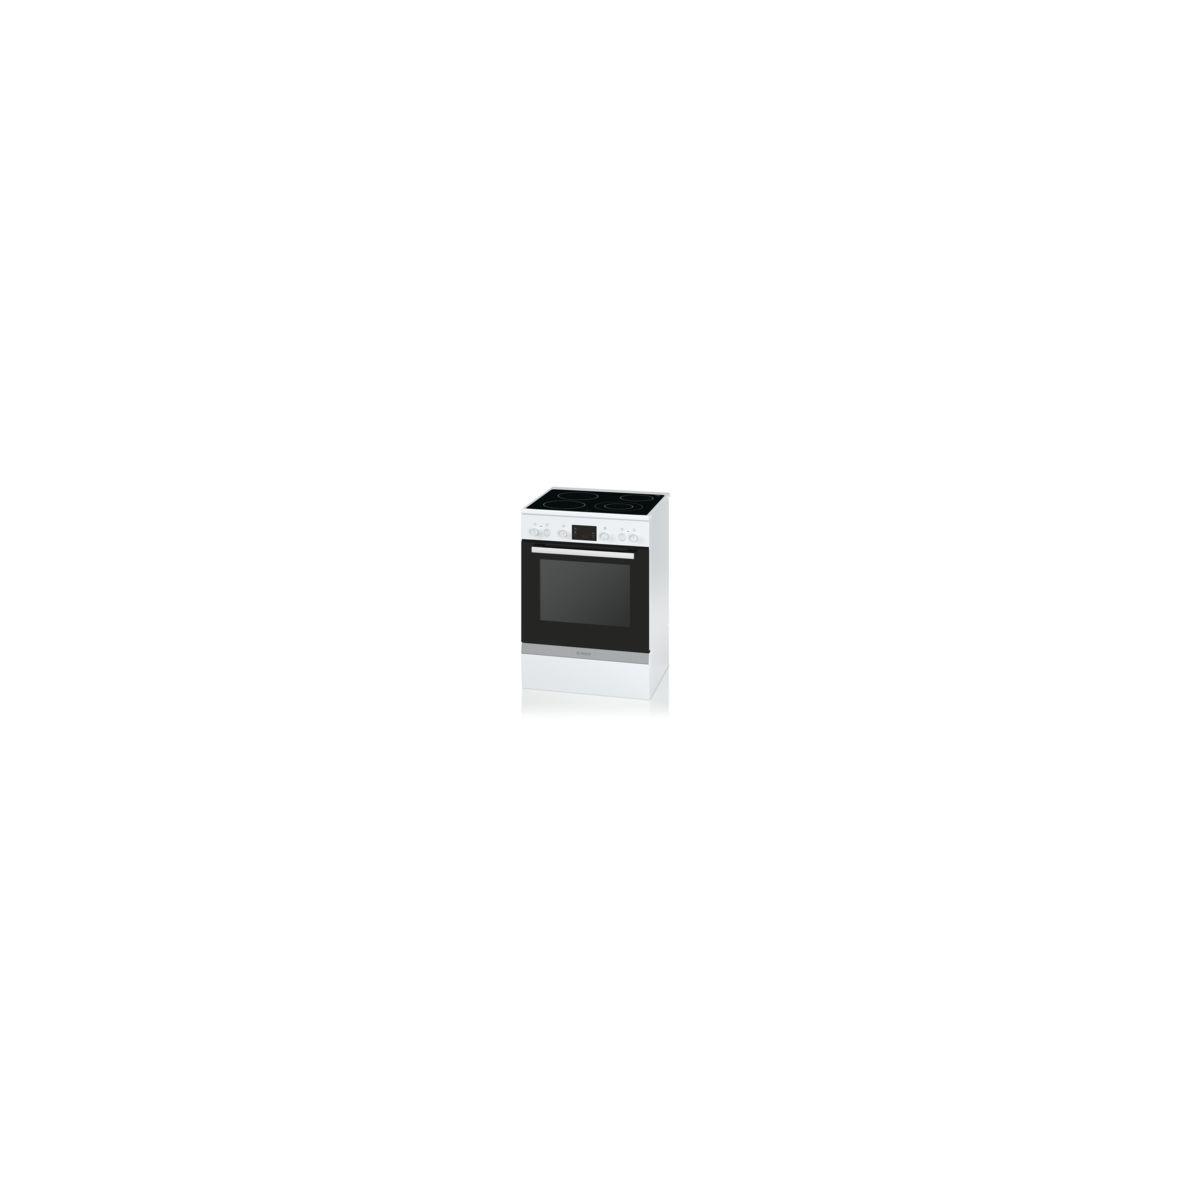 Cuisinière vitrocéramique BOSCH HCA743220F